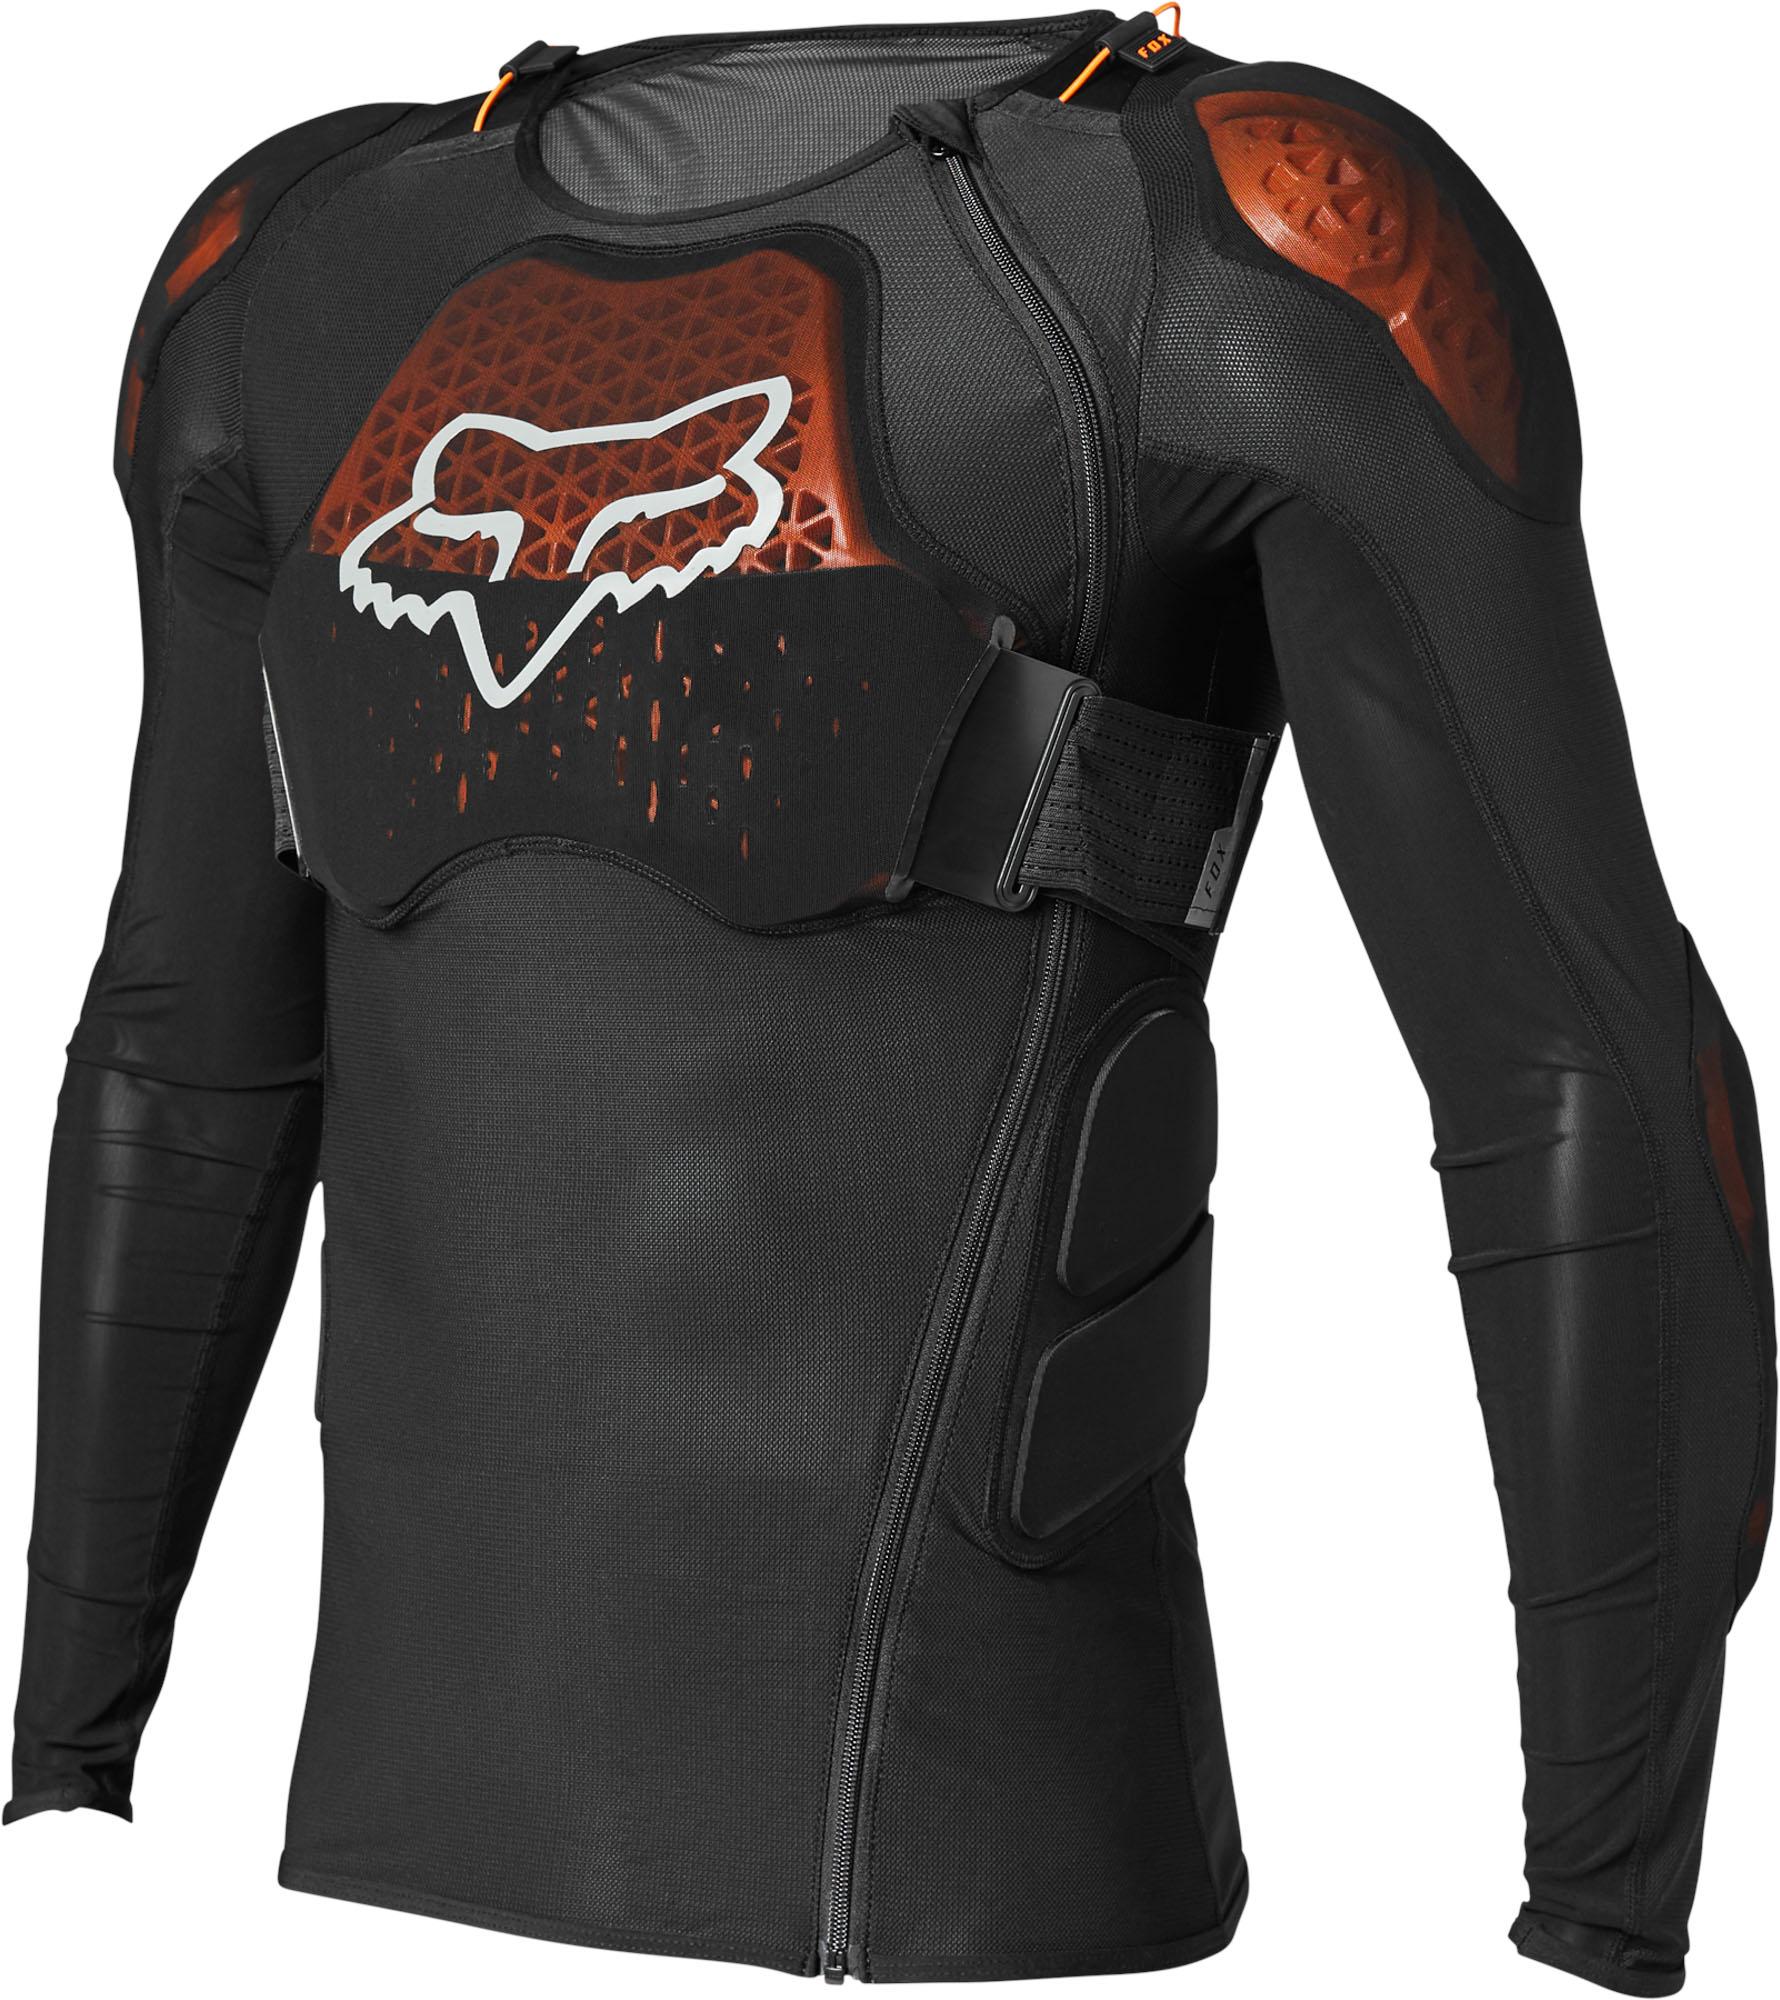 FOX Baseframe Pro D3O Jacket - Black MX22